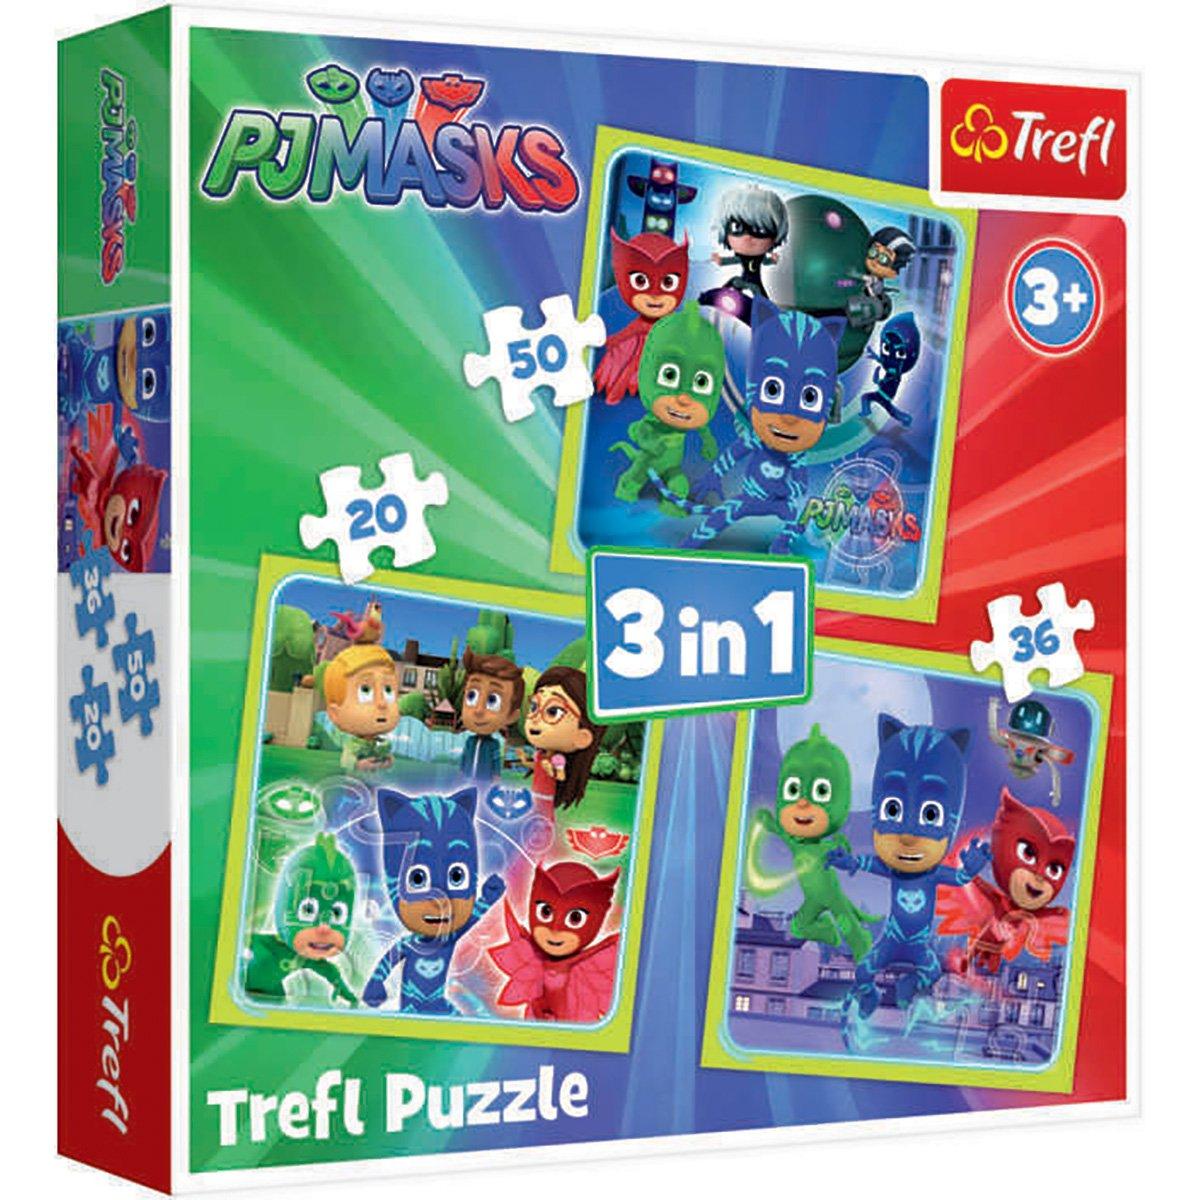 Puzzle 3 in 1 Trefl, Pj Masks, Gata de actiune (20, 36, 50 piese)